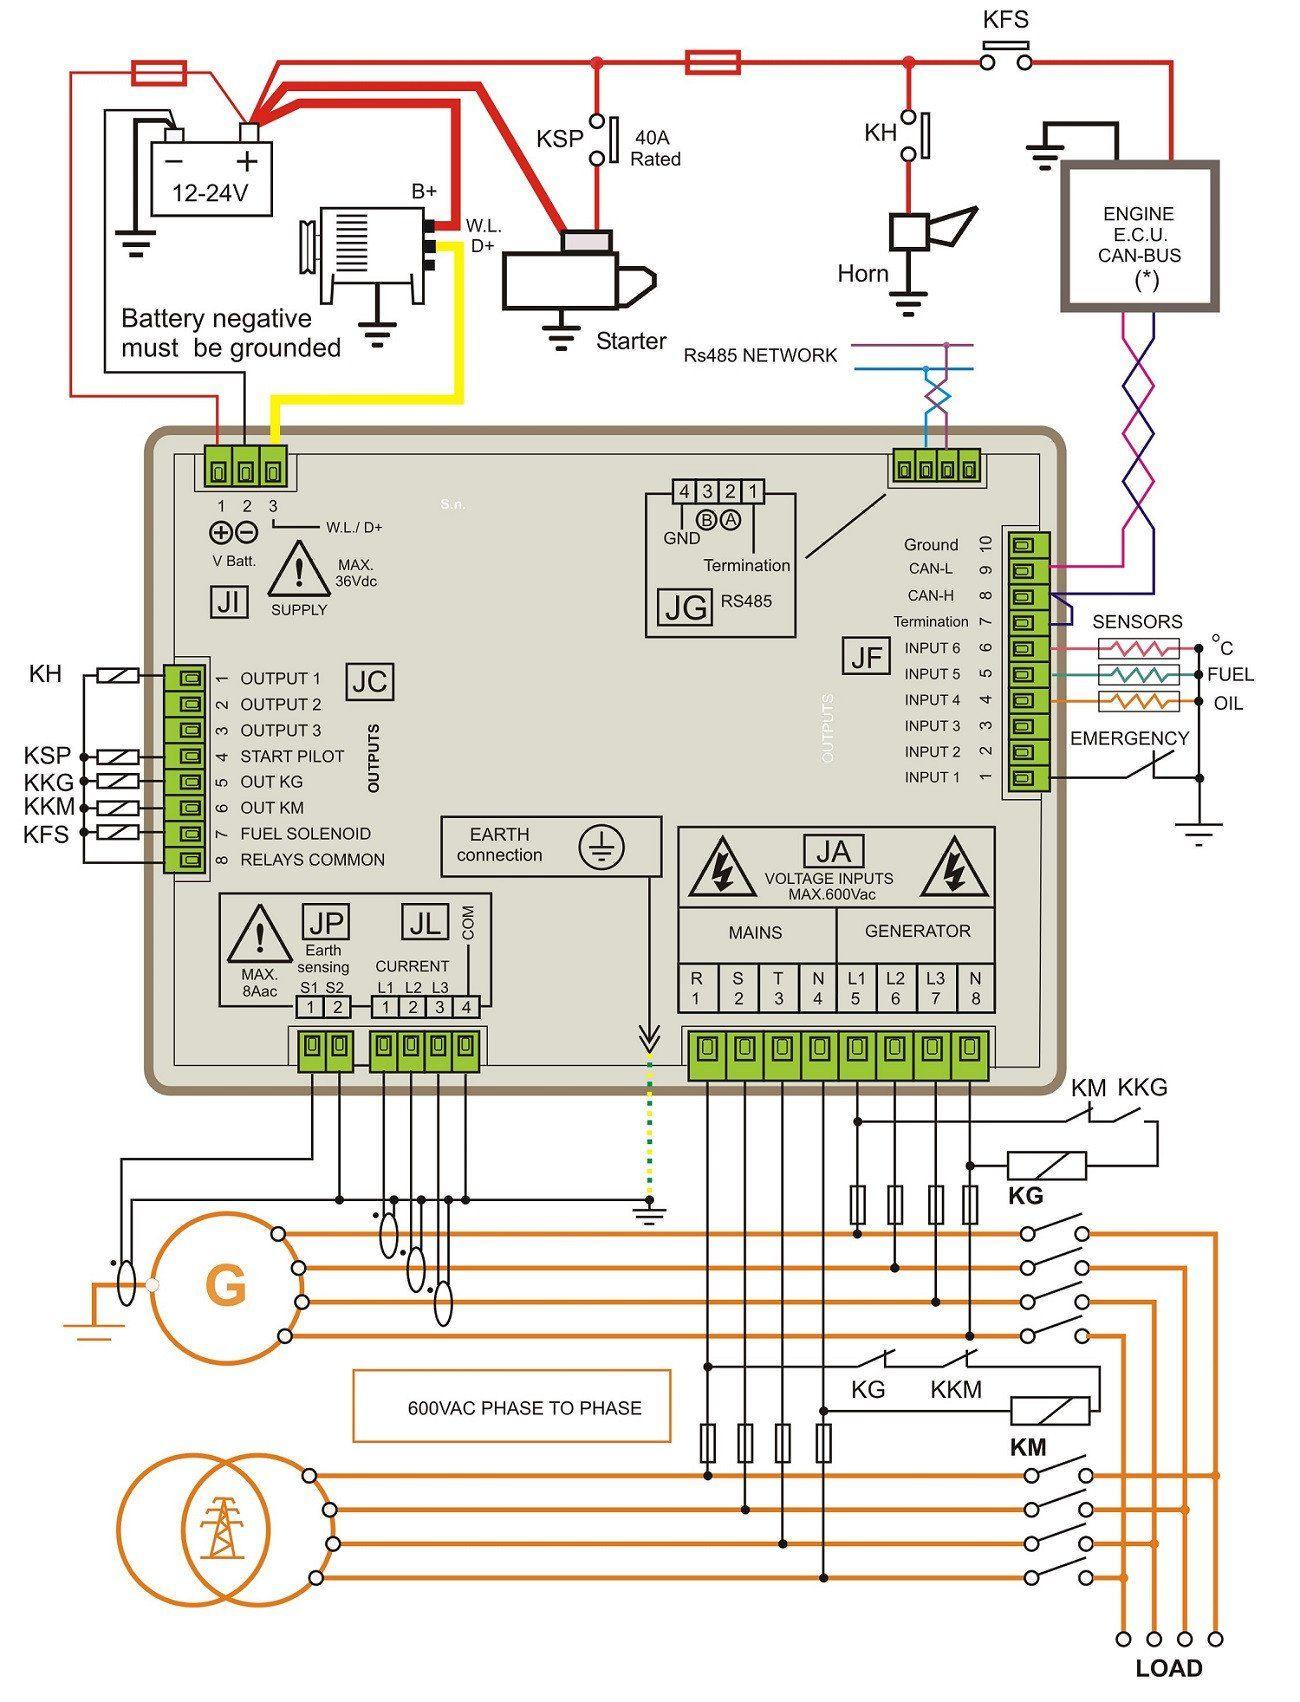 Ups Maintenance Bypass Switch Wiring Diagram Gallery Schaltplan Elektroschaltplan Elektroverkabelung